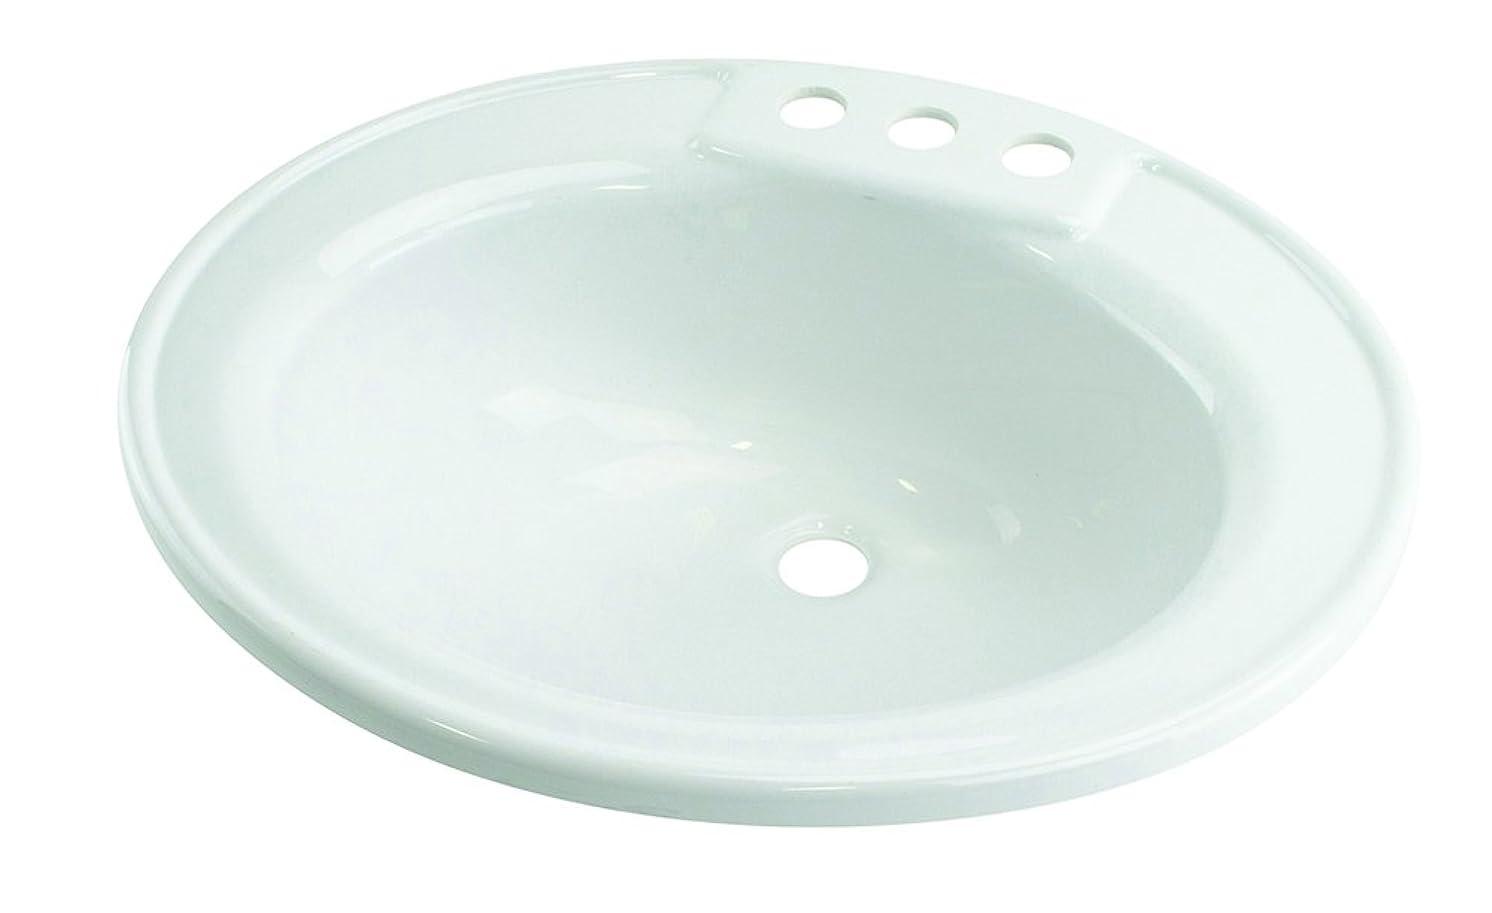 Lippert 209635 Better Bath RV Oval Lavatory Sink 17